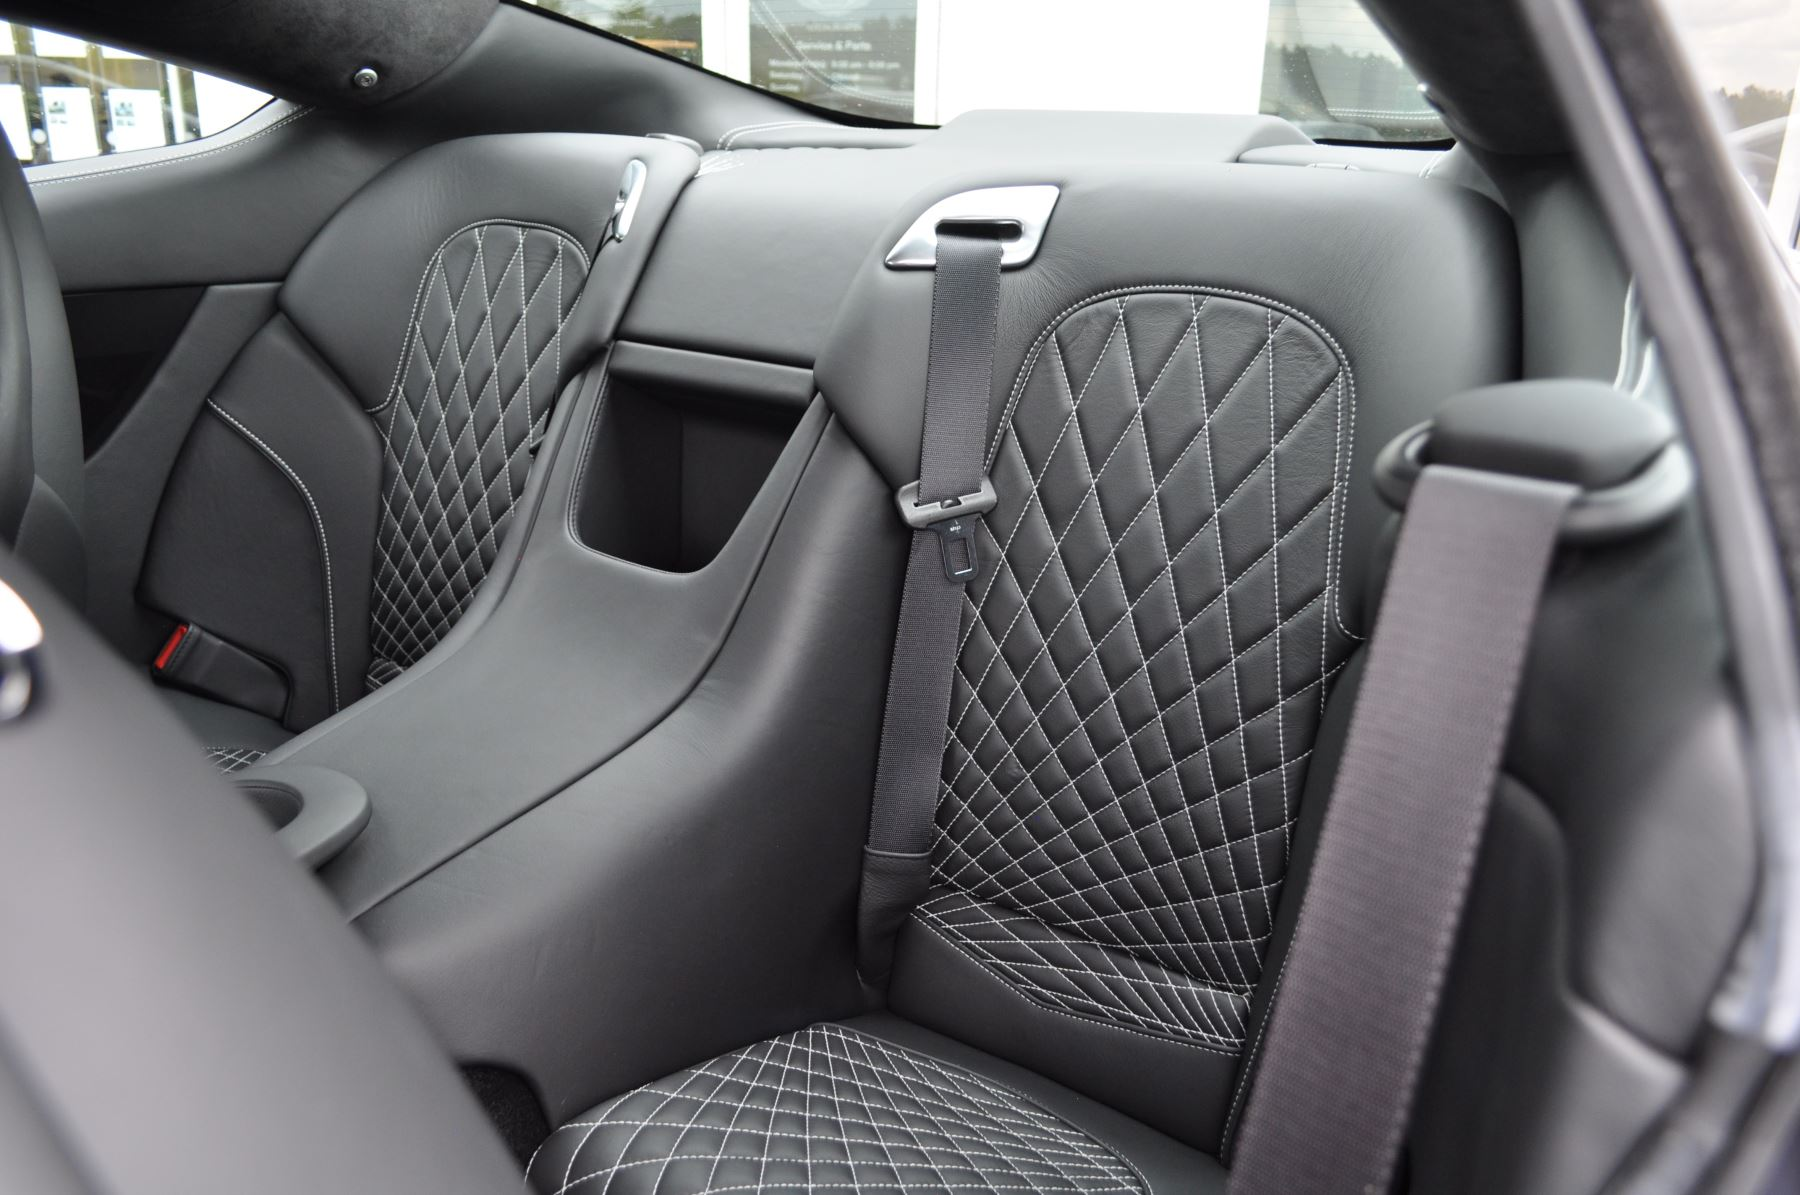 Aston Martin Vanquish S V12 [595] S 2+2 2dr Touchtronic image 36